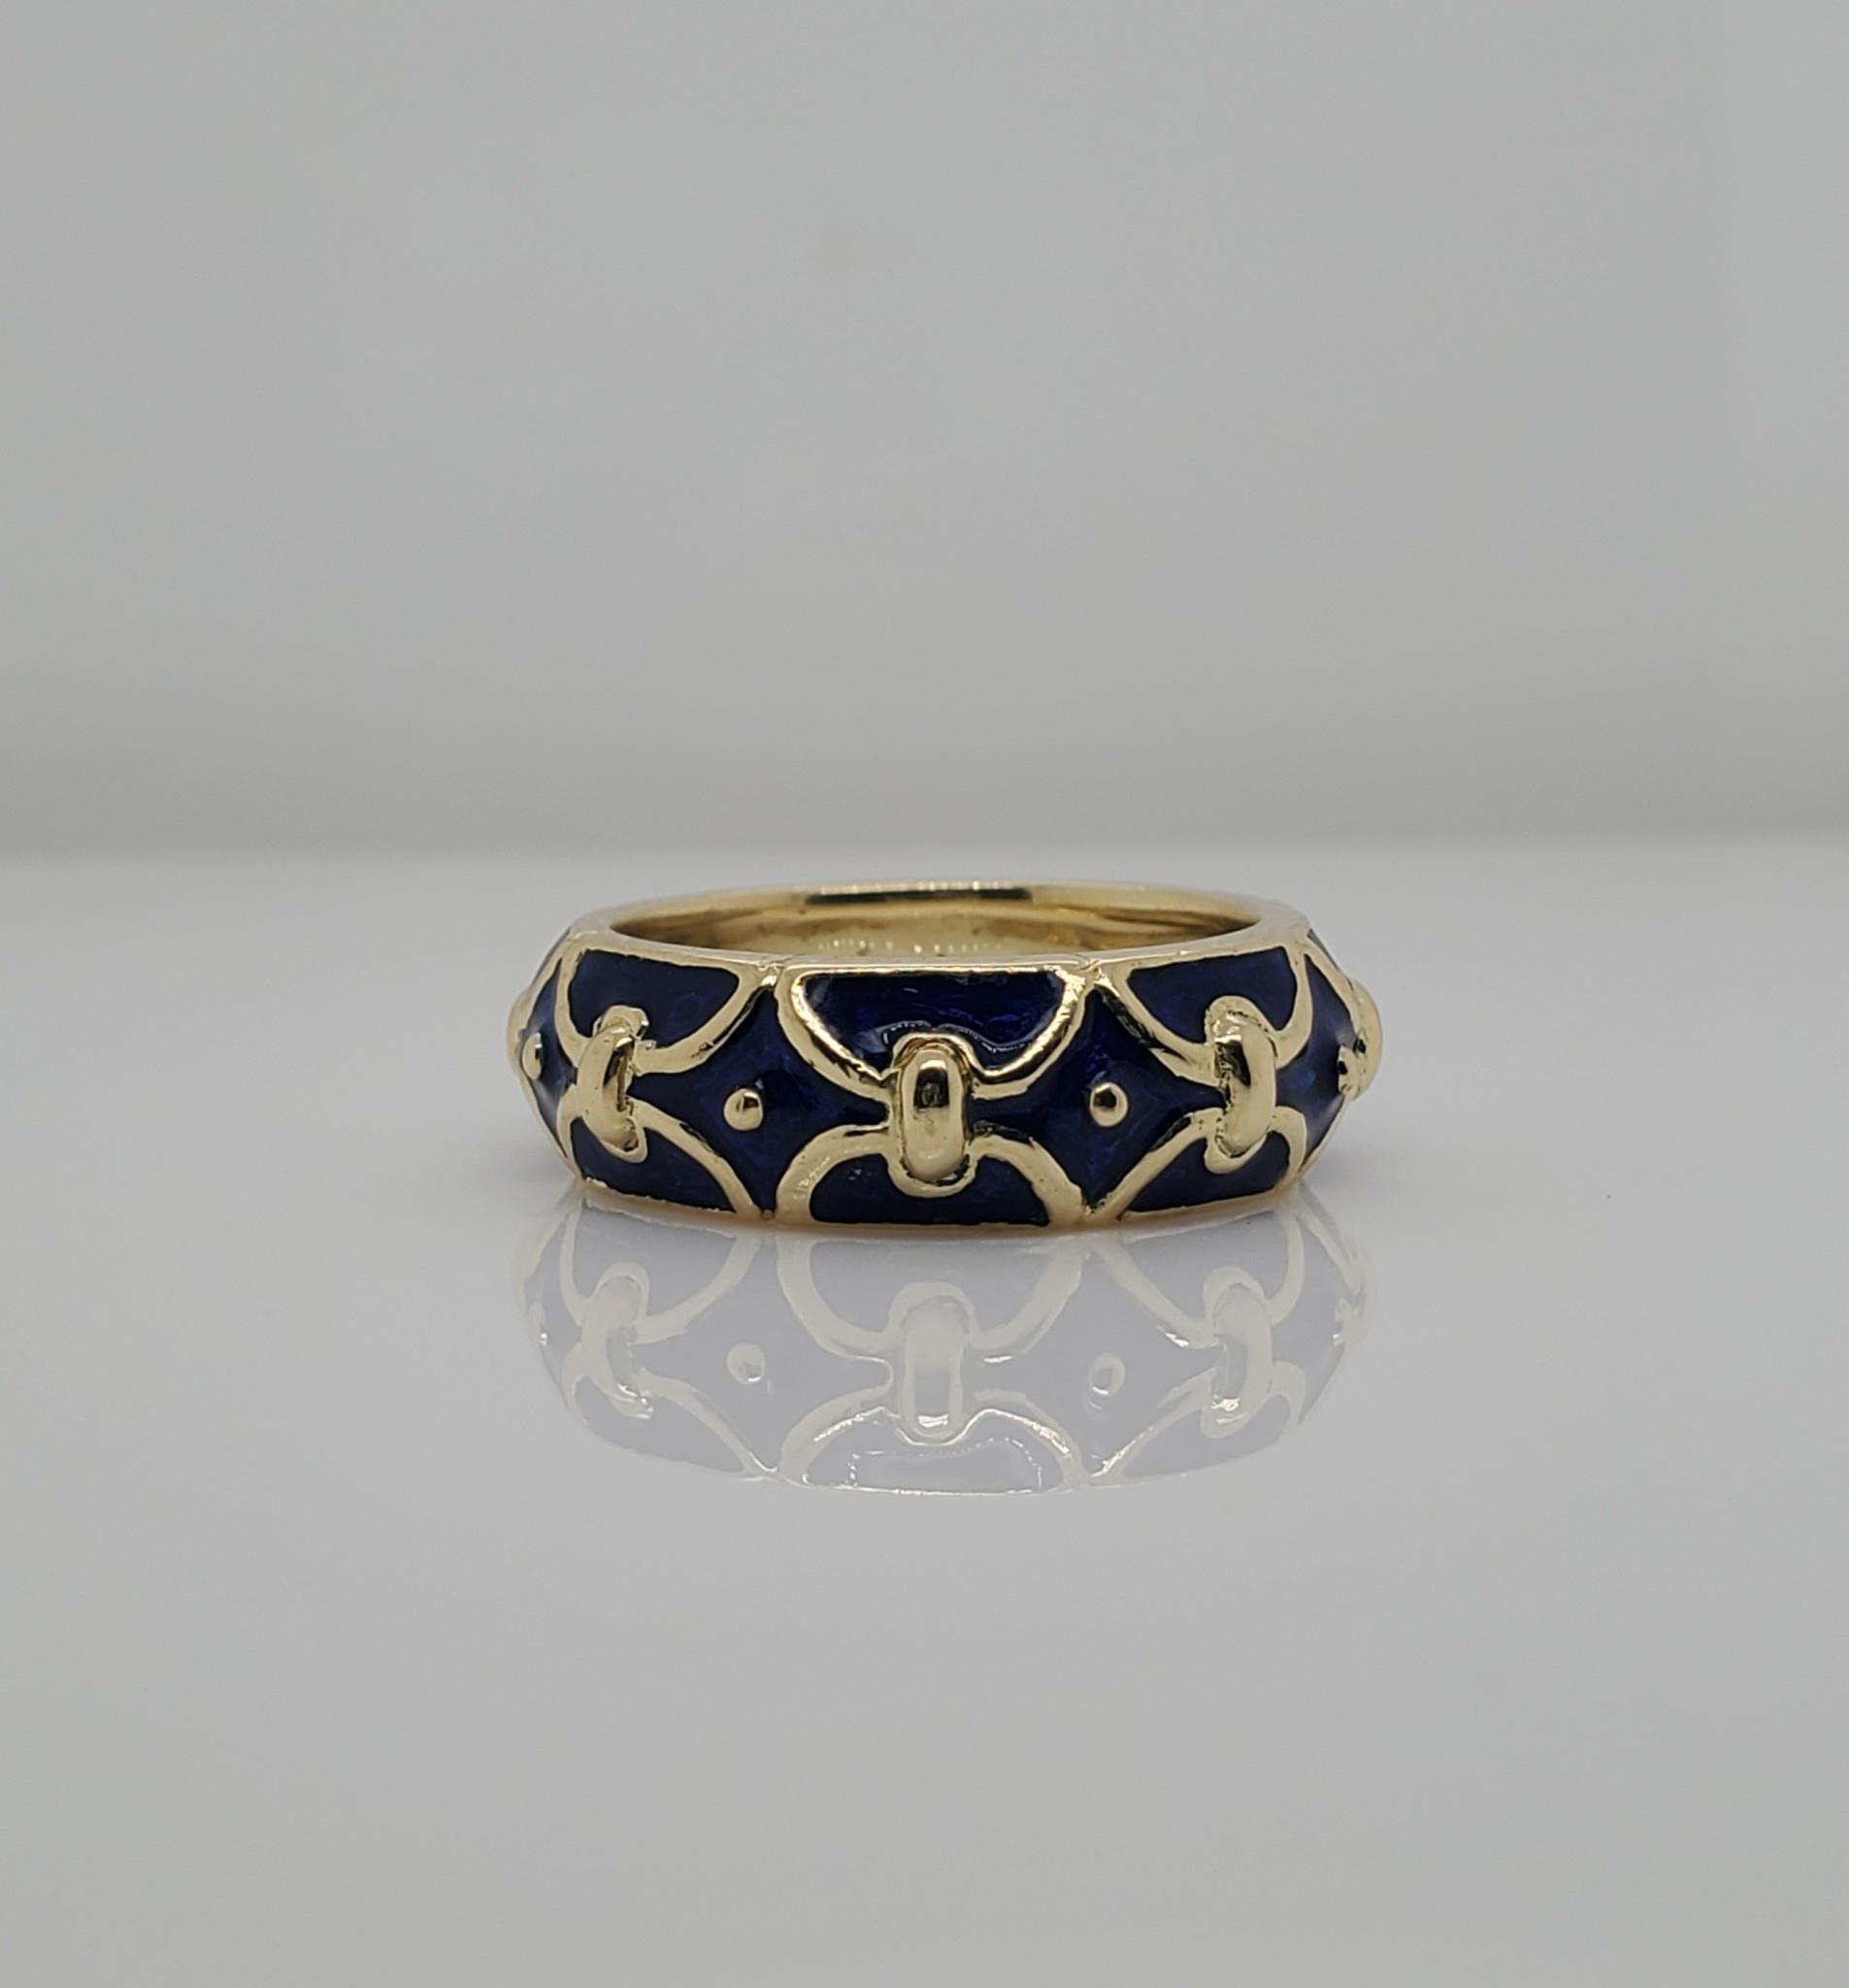 18KT YG Blue Enamel Estate Ring